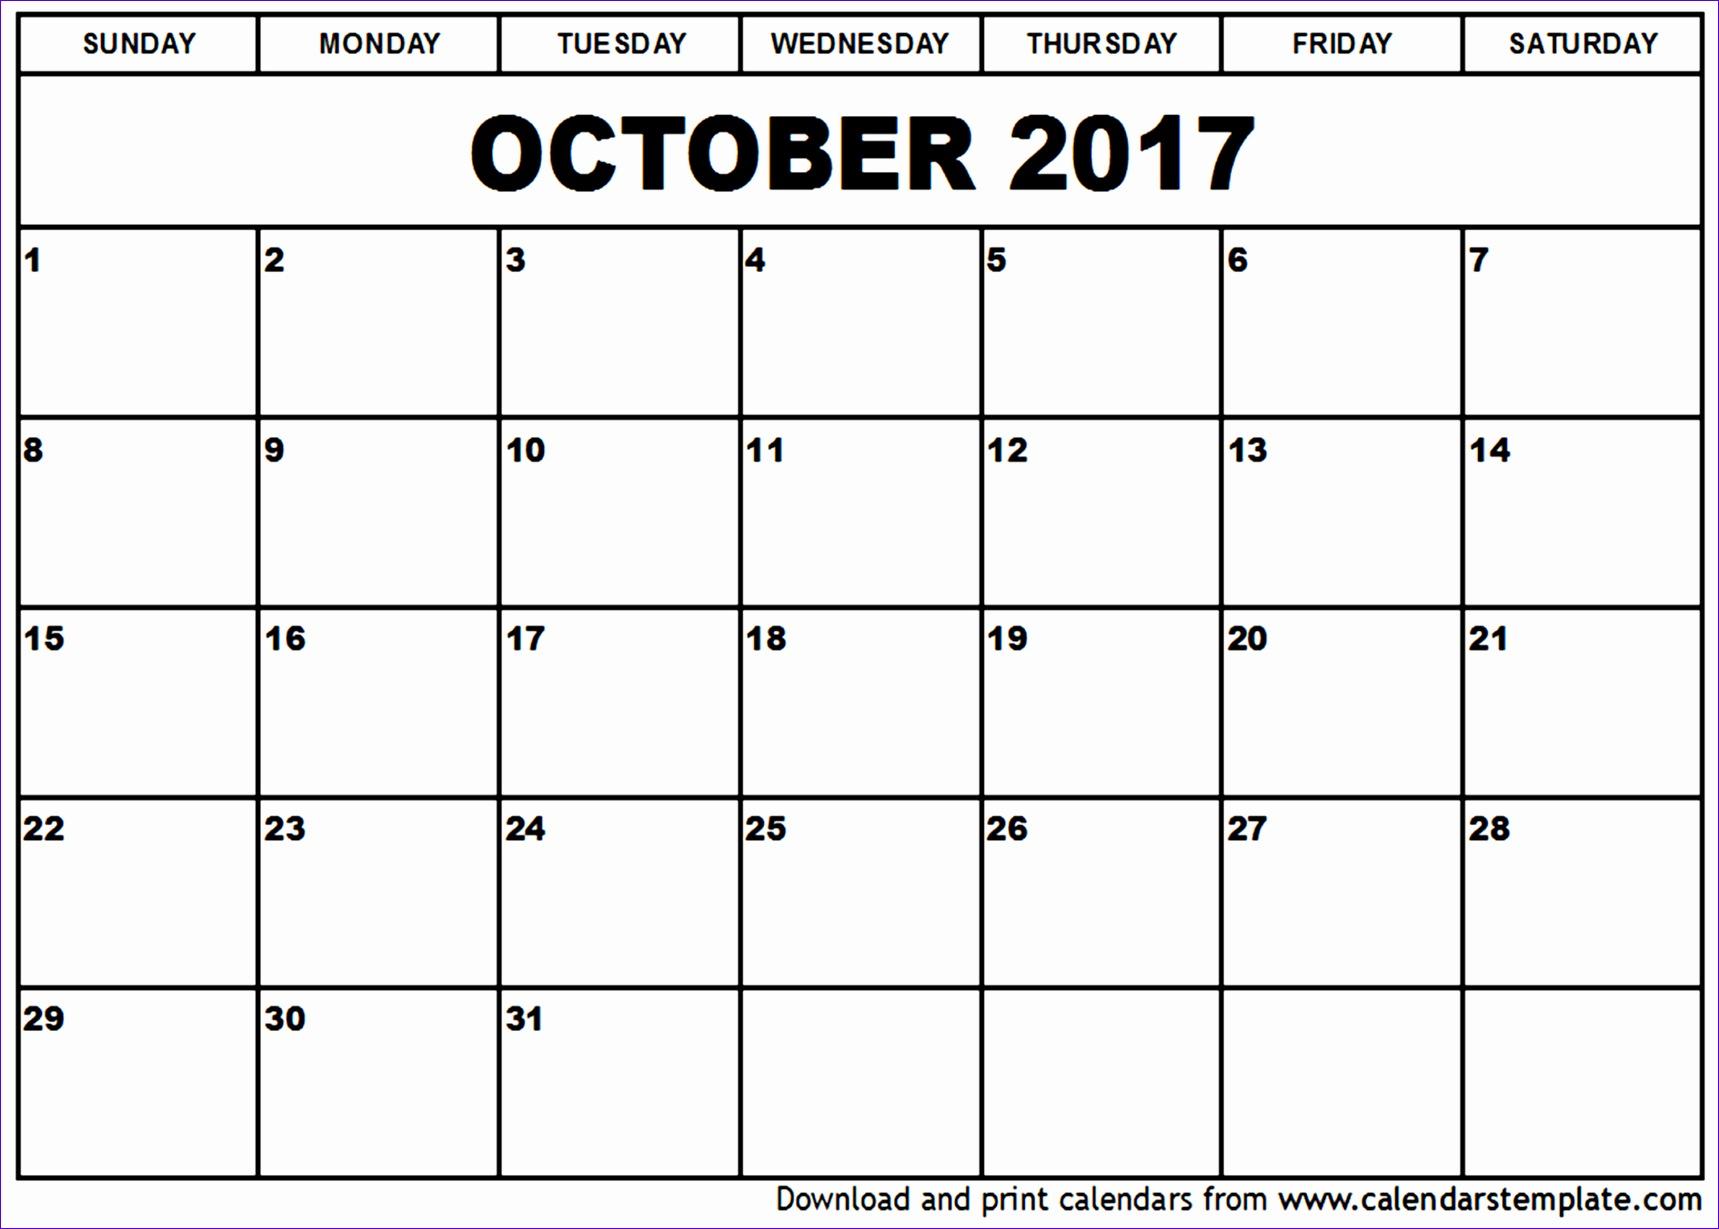 october 2017 calendar template 1363 17191229